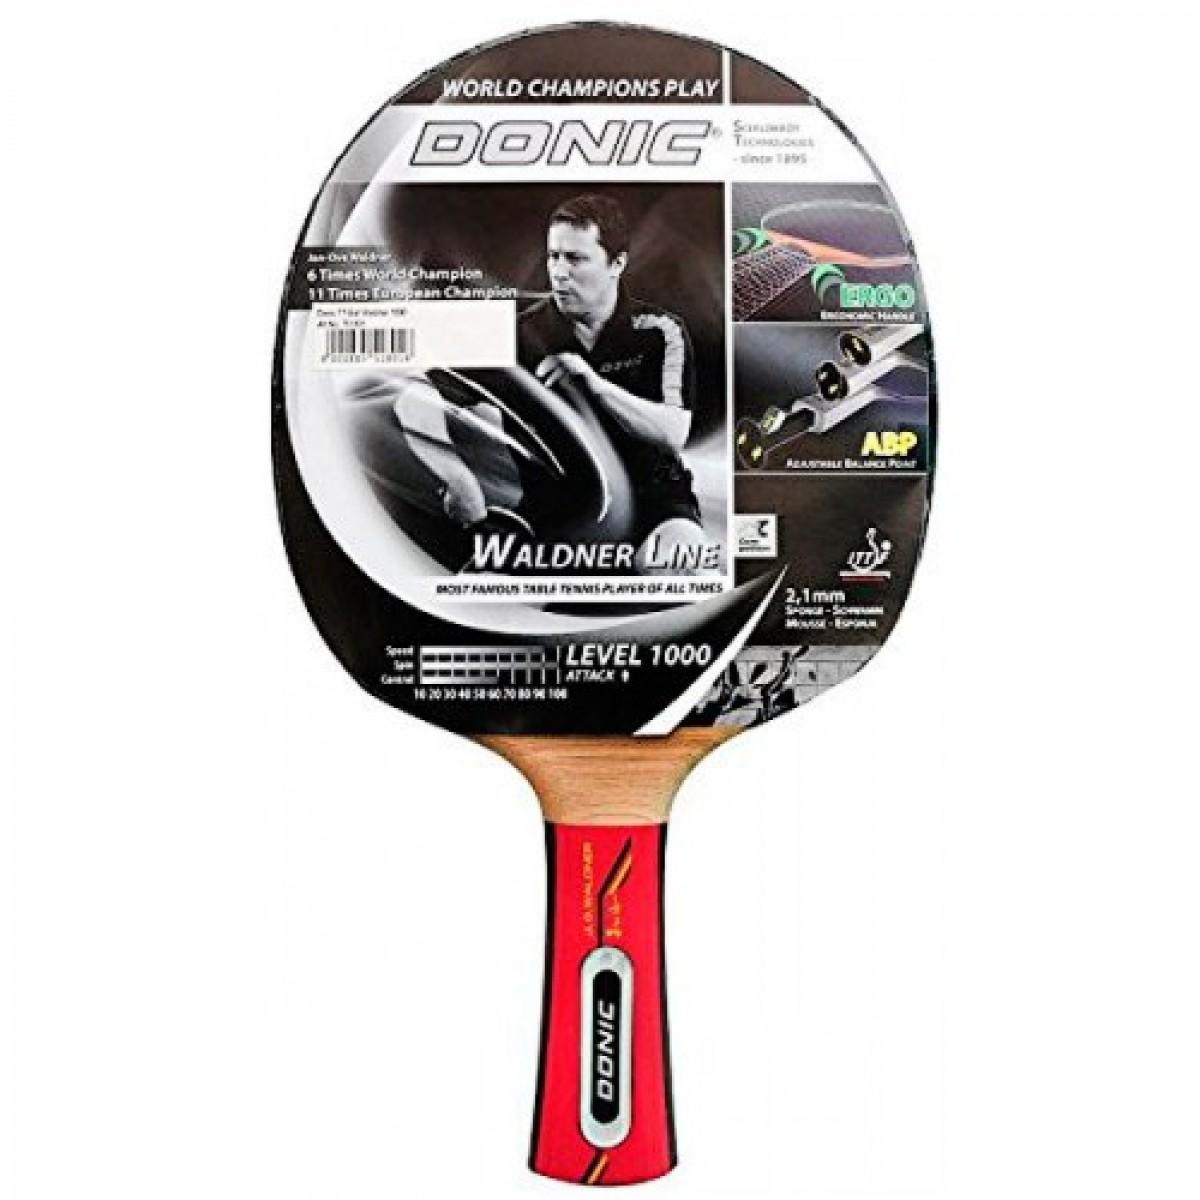 Ракетка для настольного тенниса Waldner 1000. Купить ракетку для ... 1197e4db4183e